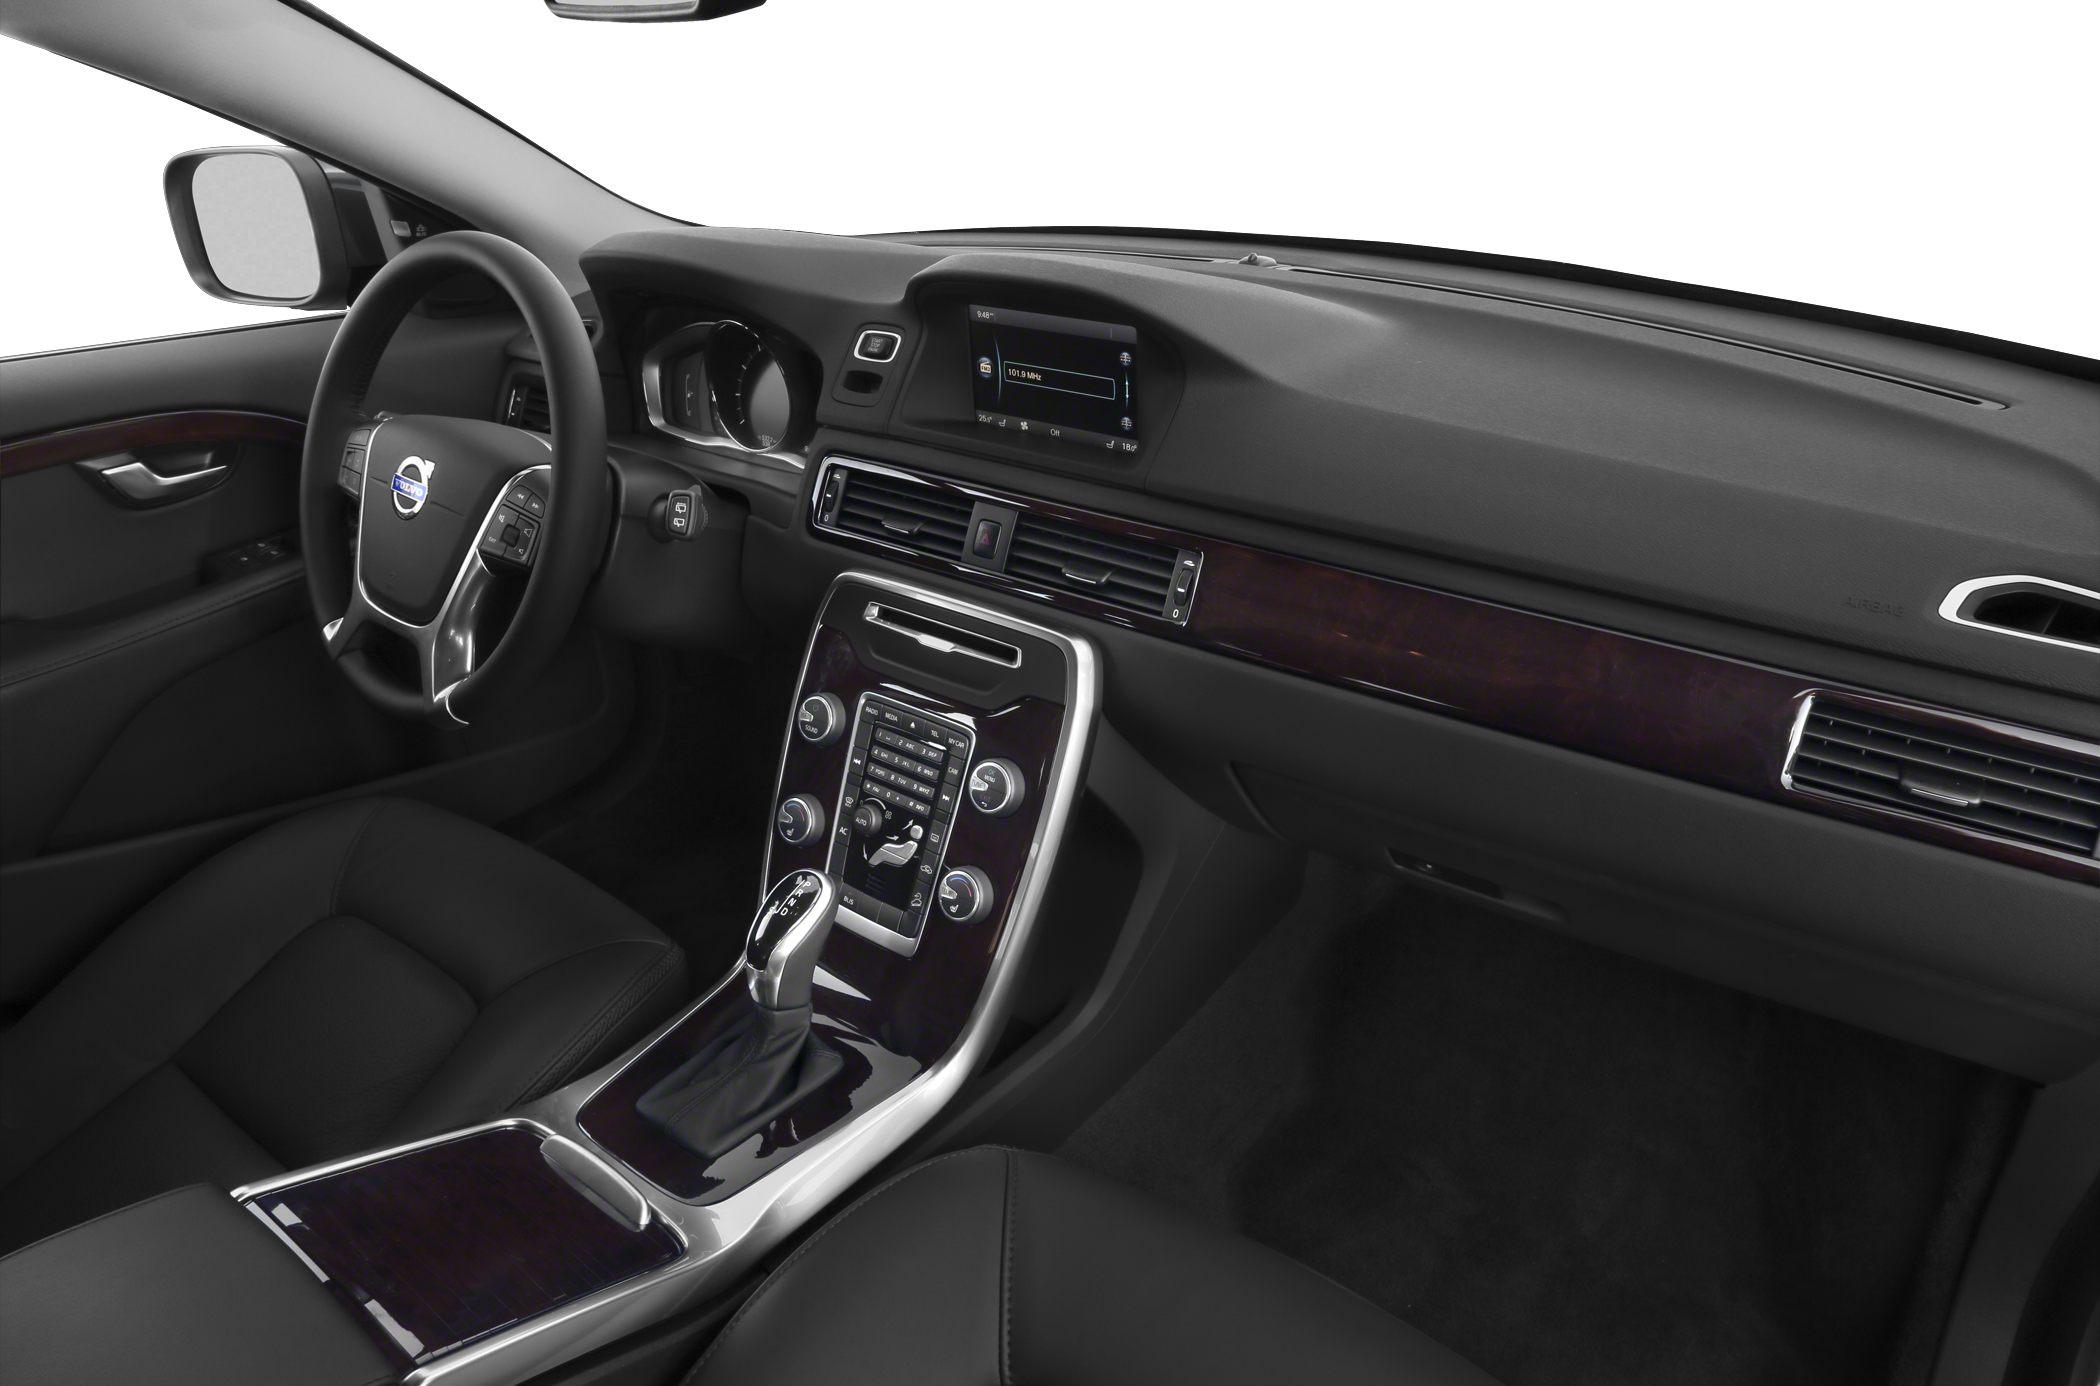 2014 Volvo XC70 Interior